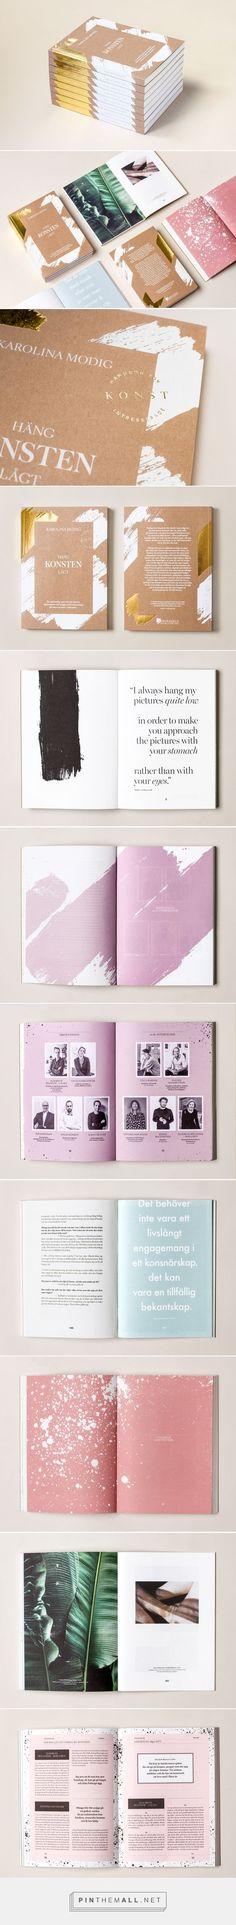 Häng konsten lågt Art Book Branding on Behance | Fivestar Branding – Design and Branding Agency & Inspiration Gallery